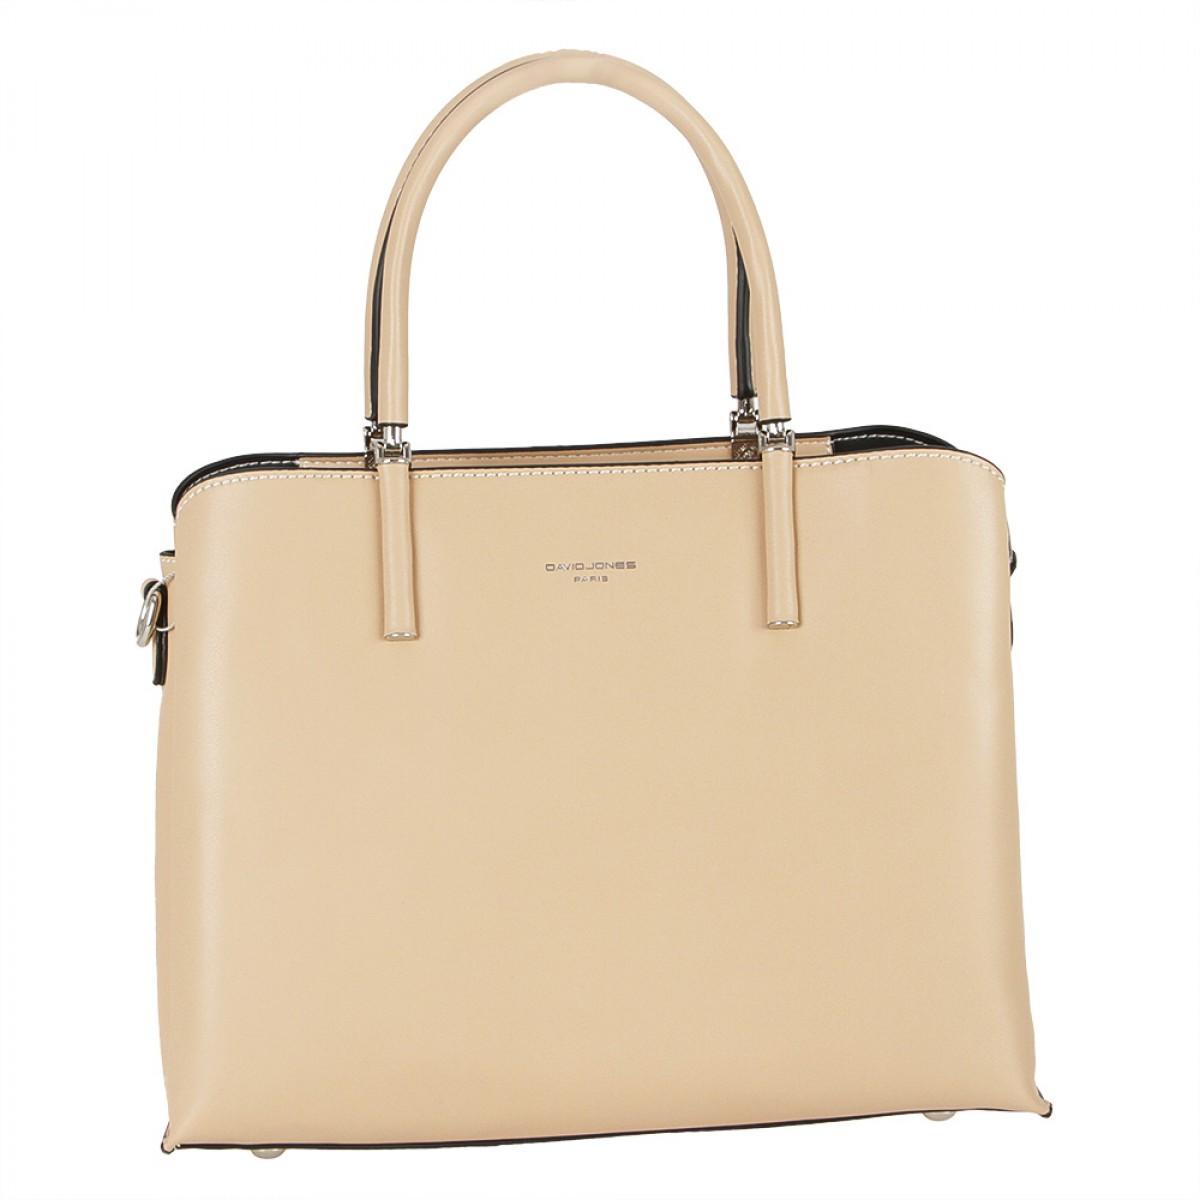 Жіноча сумка David Jones CM5631 L.CAMEL